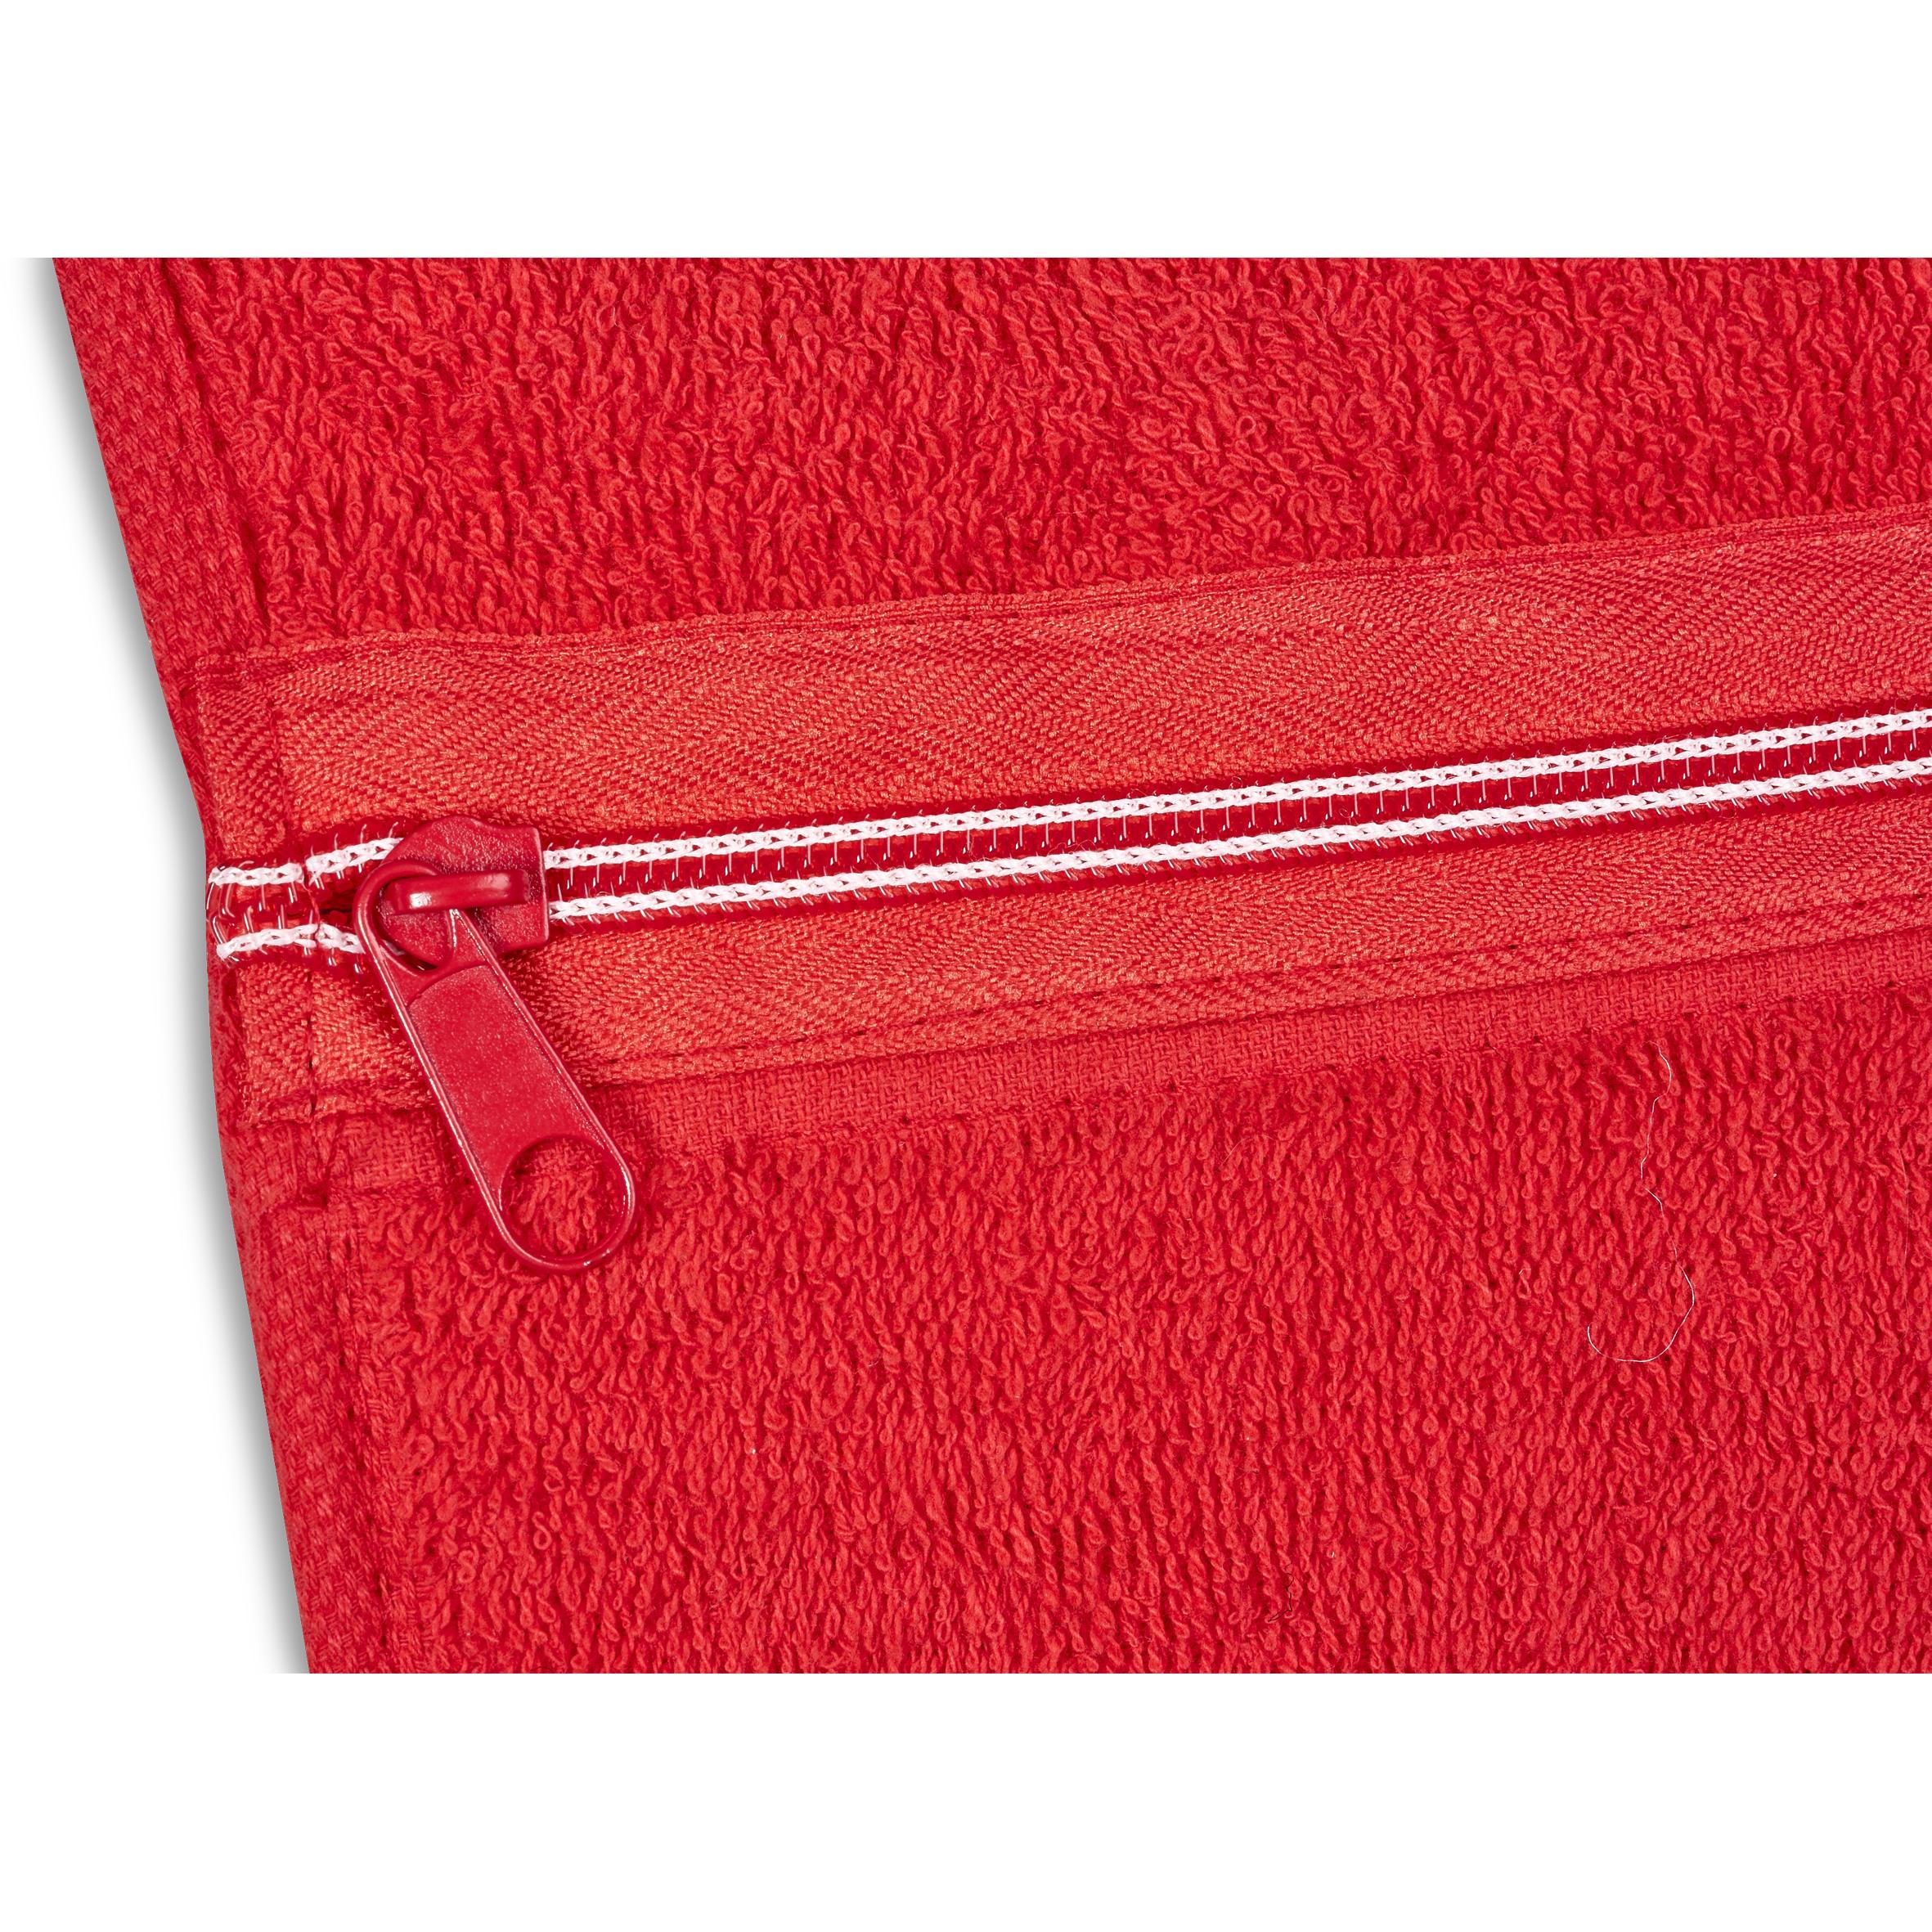 Slazenger Wembley Gym Towel